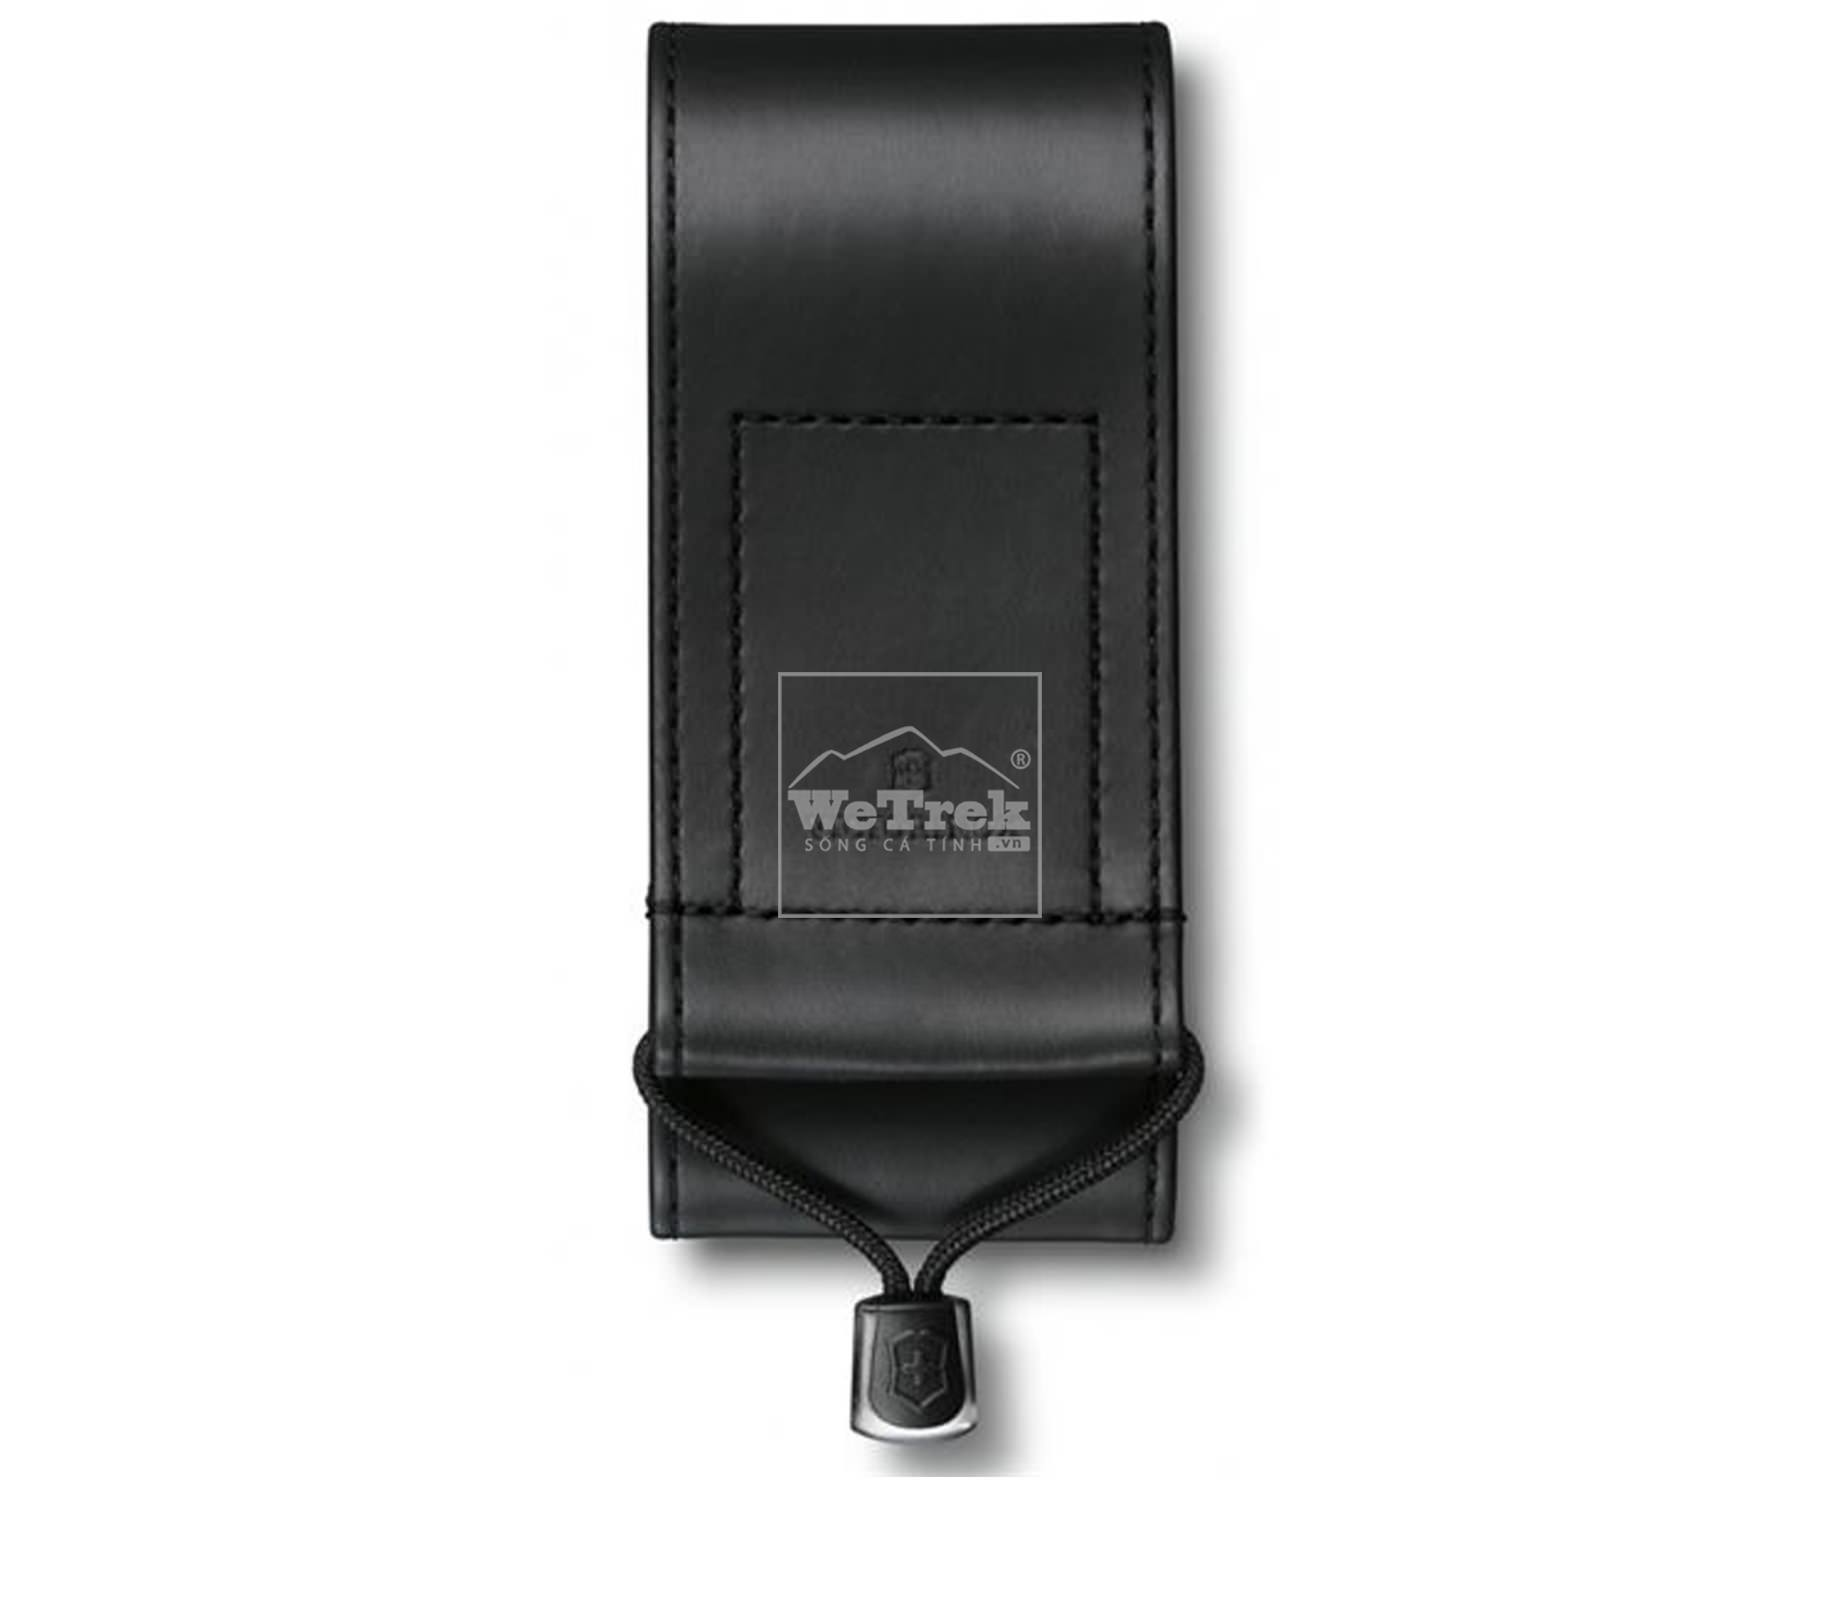 Bao da dao đa năng VICTORINOX Synthetic Leather Pouch 4.0482.3 - 7151